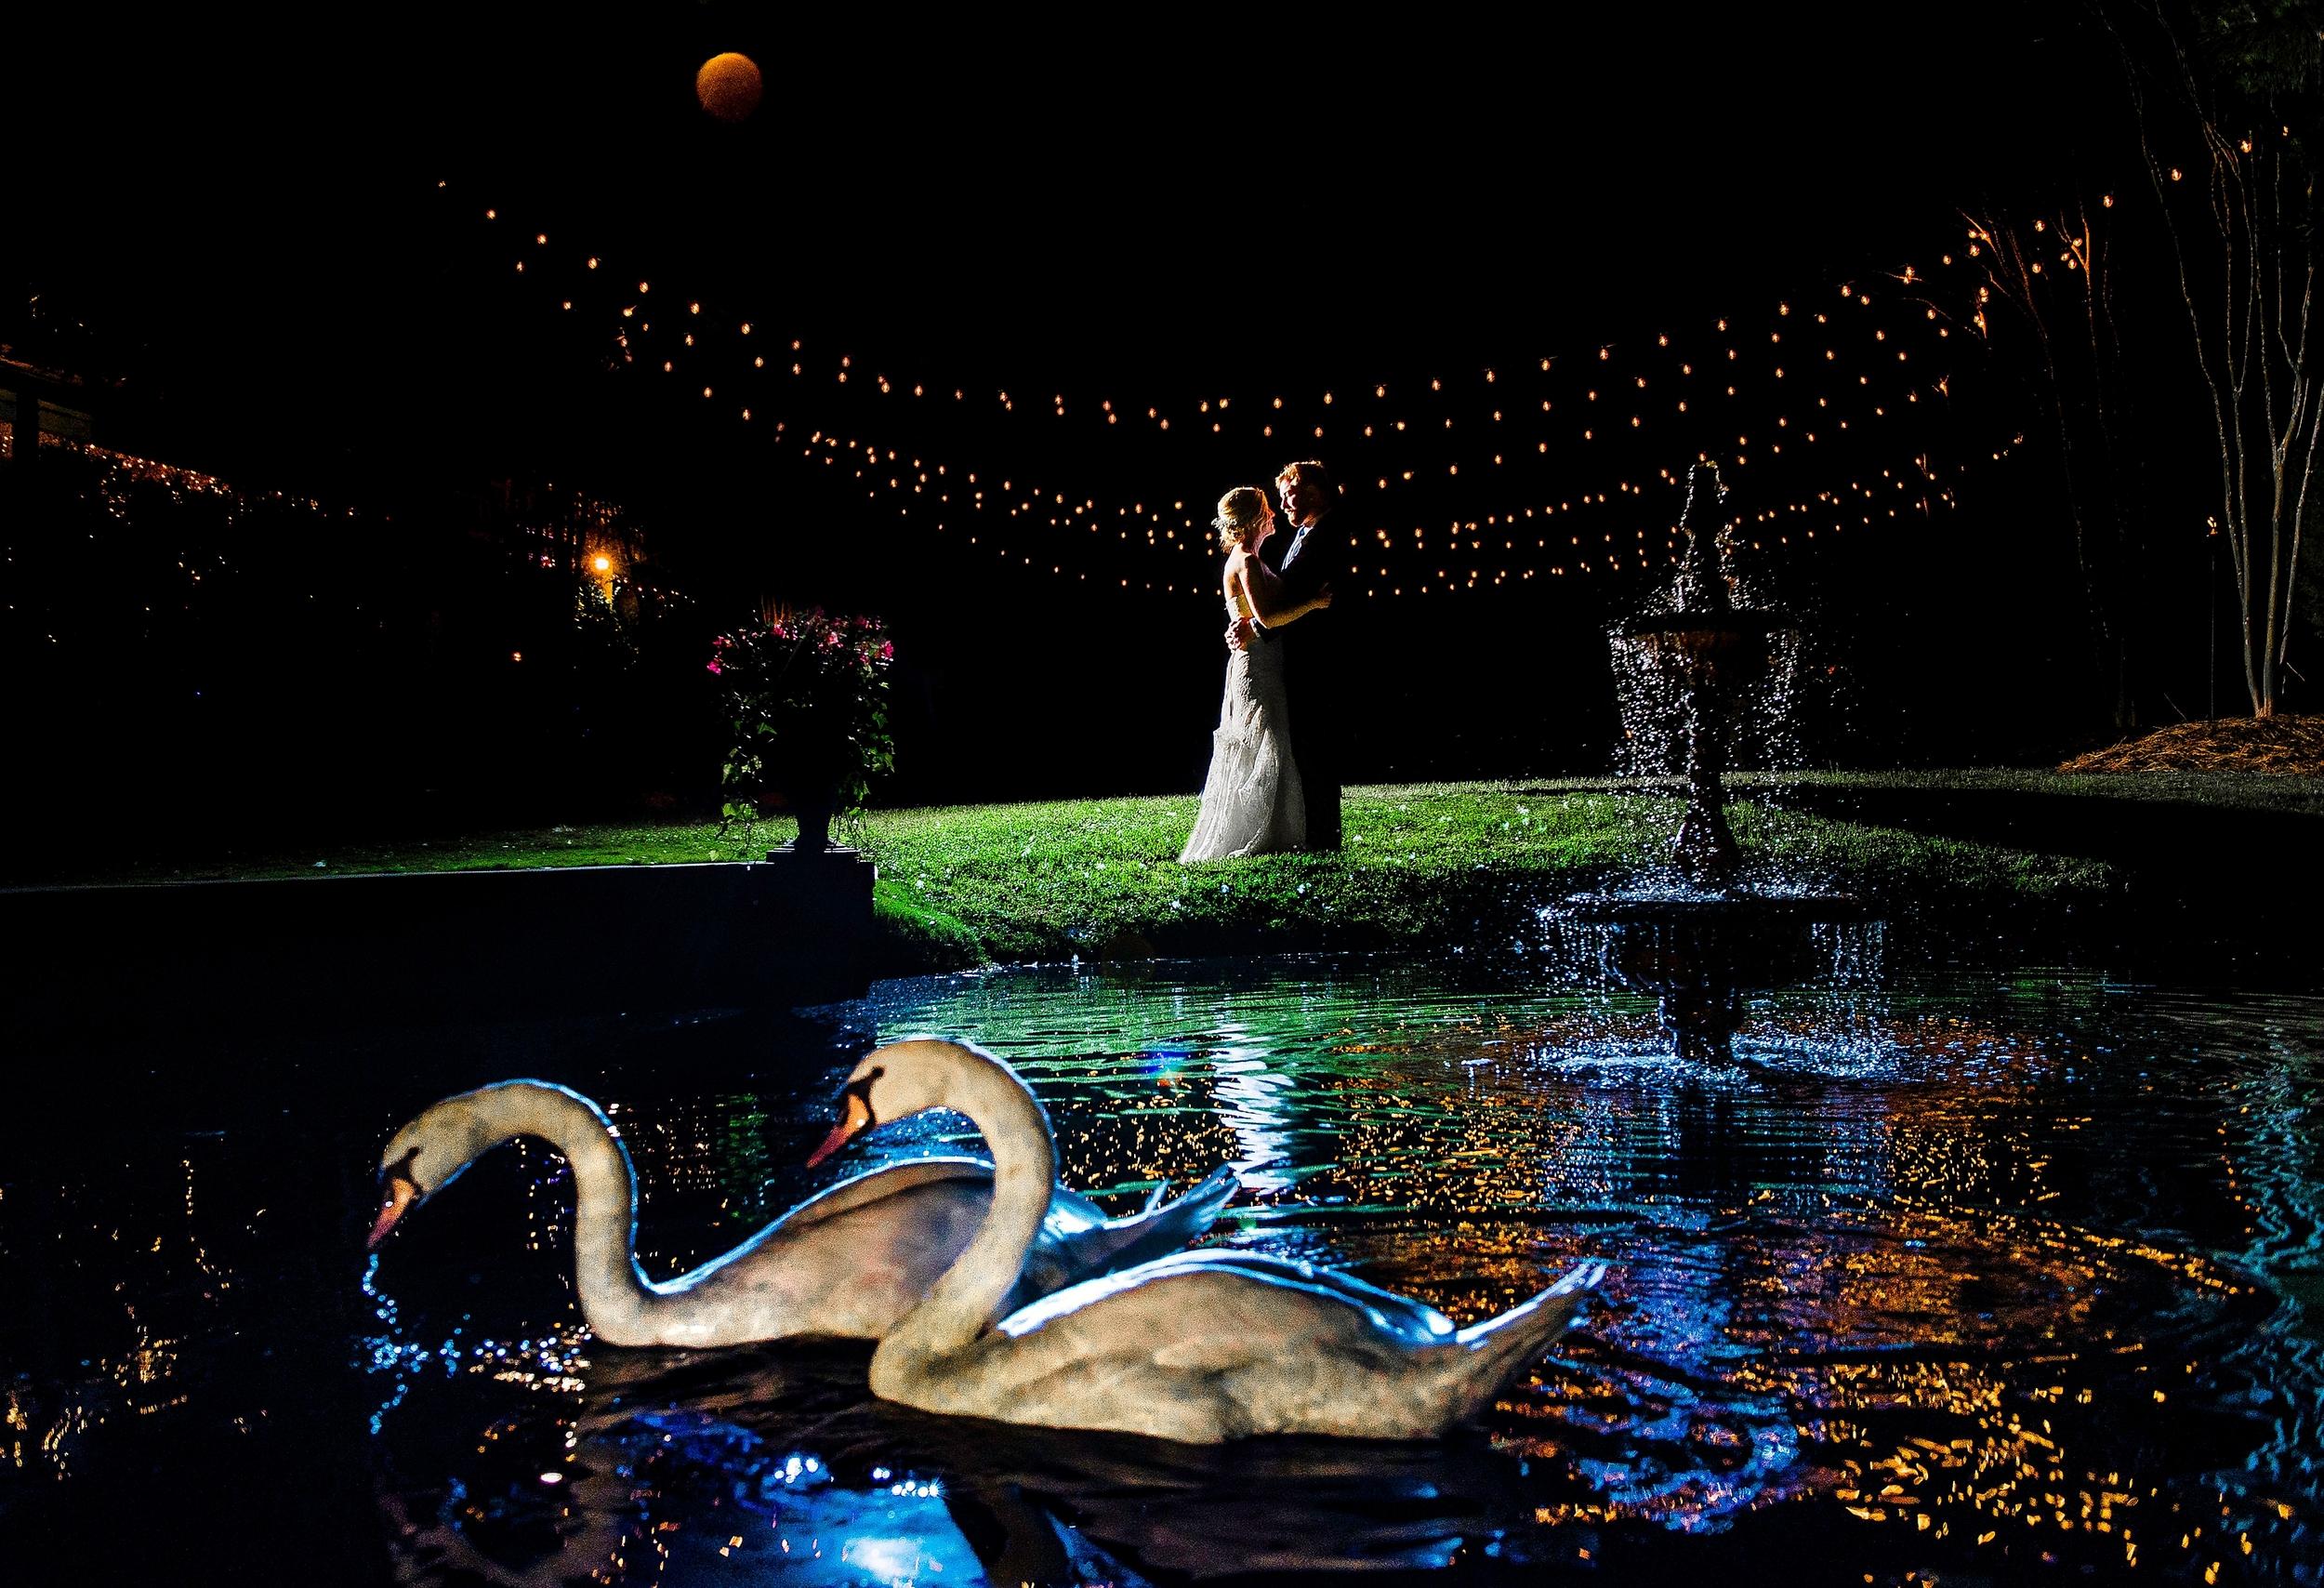 An amazing Watson House wedding in Emerald Isle, NC by Chad Winstead Photography